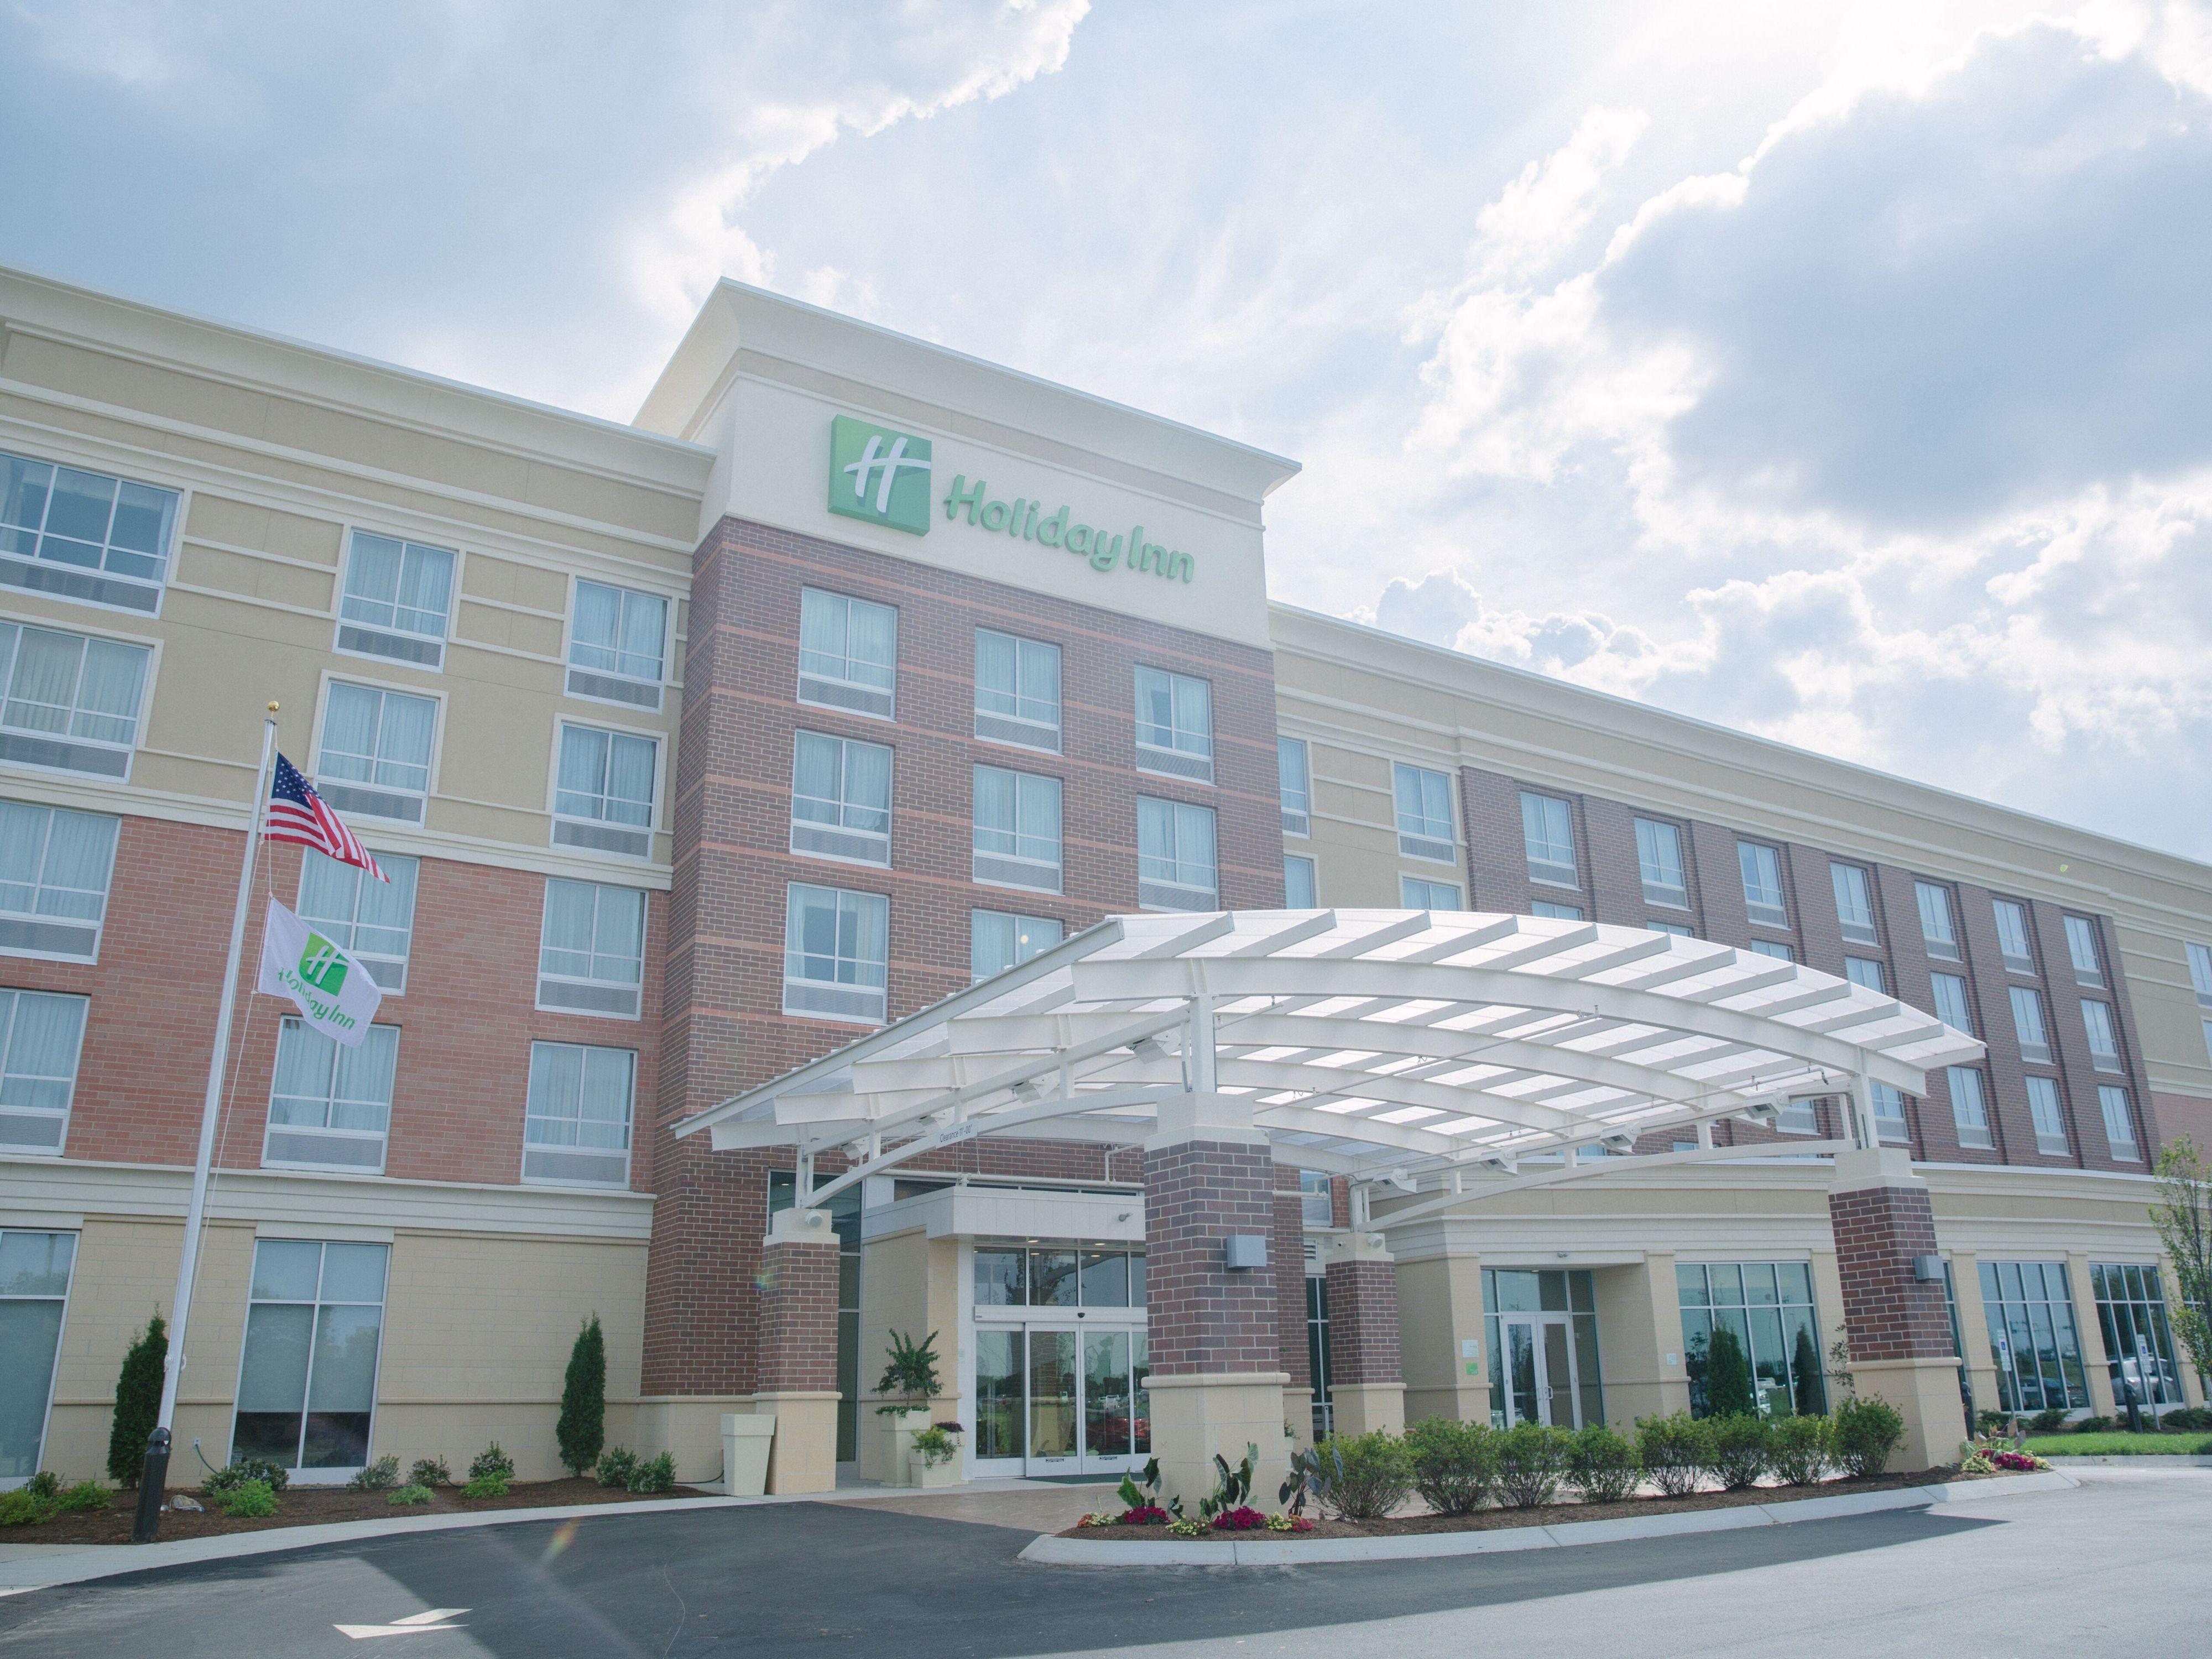 Holiday Inn Murfreesboro In Smyrna Tennessee